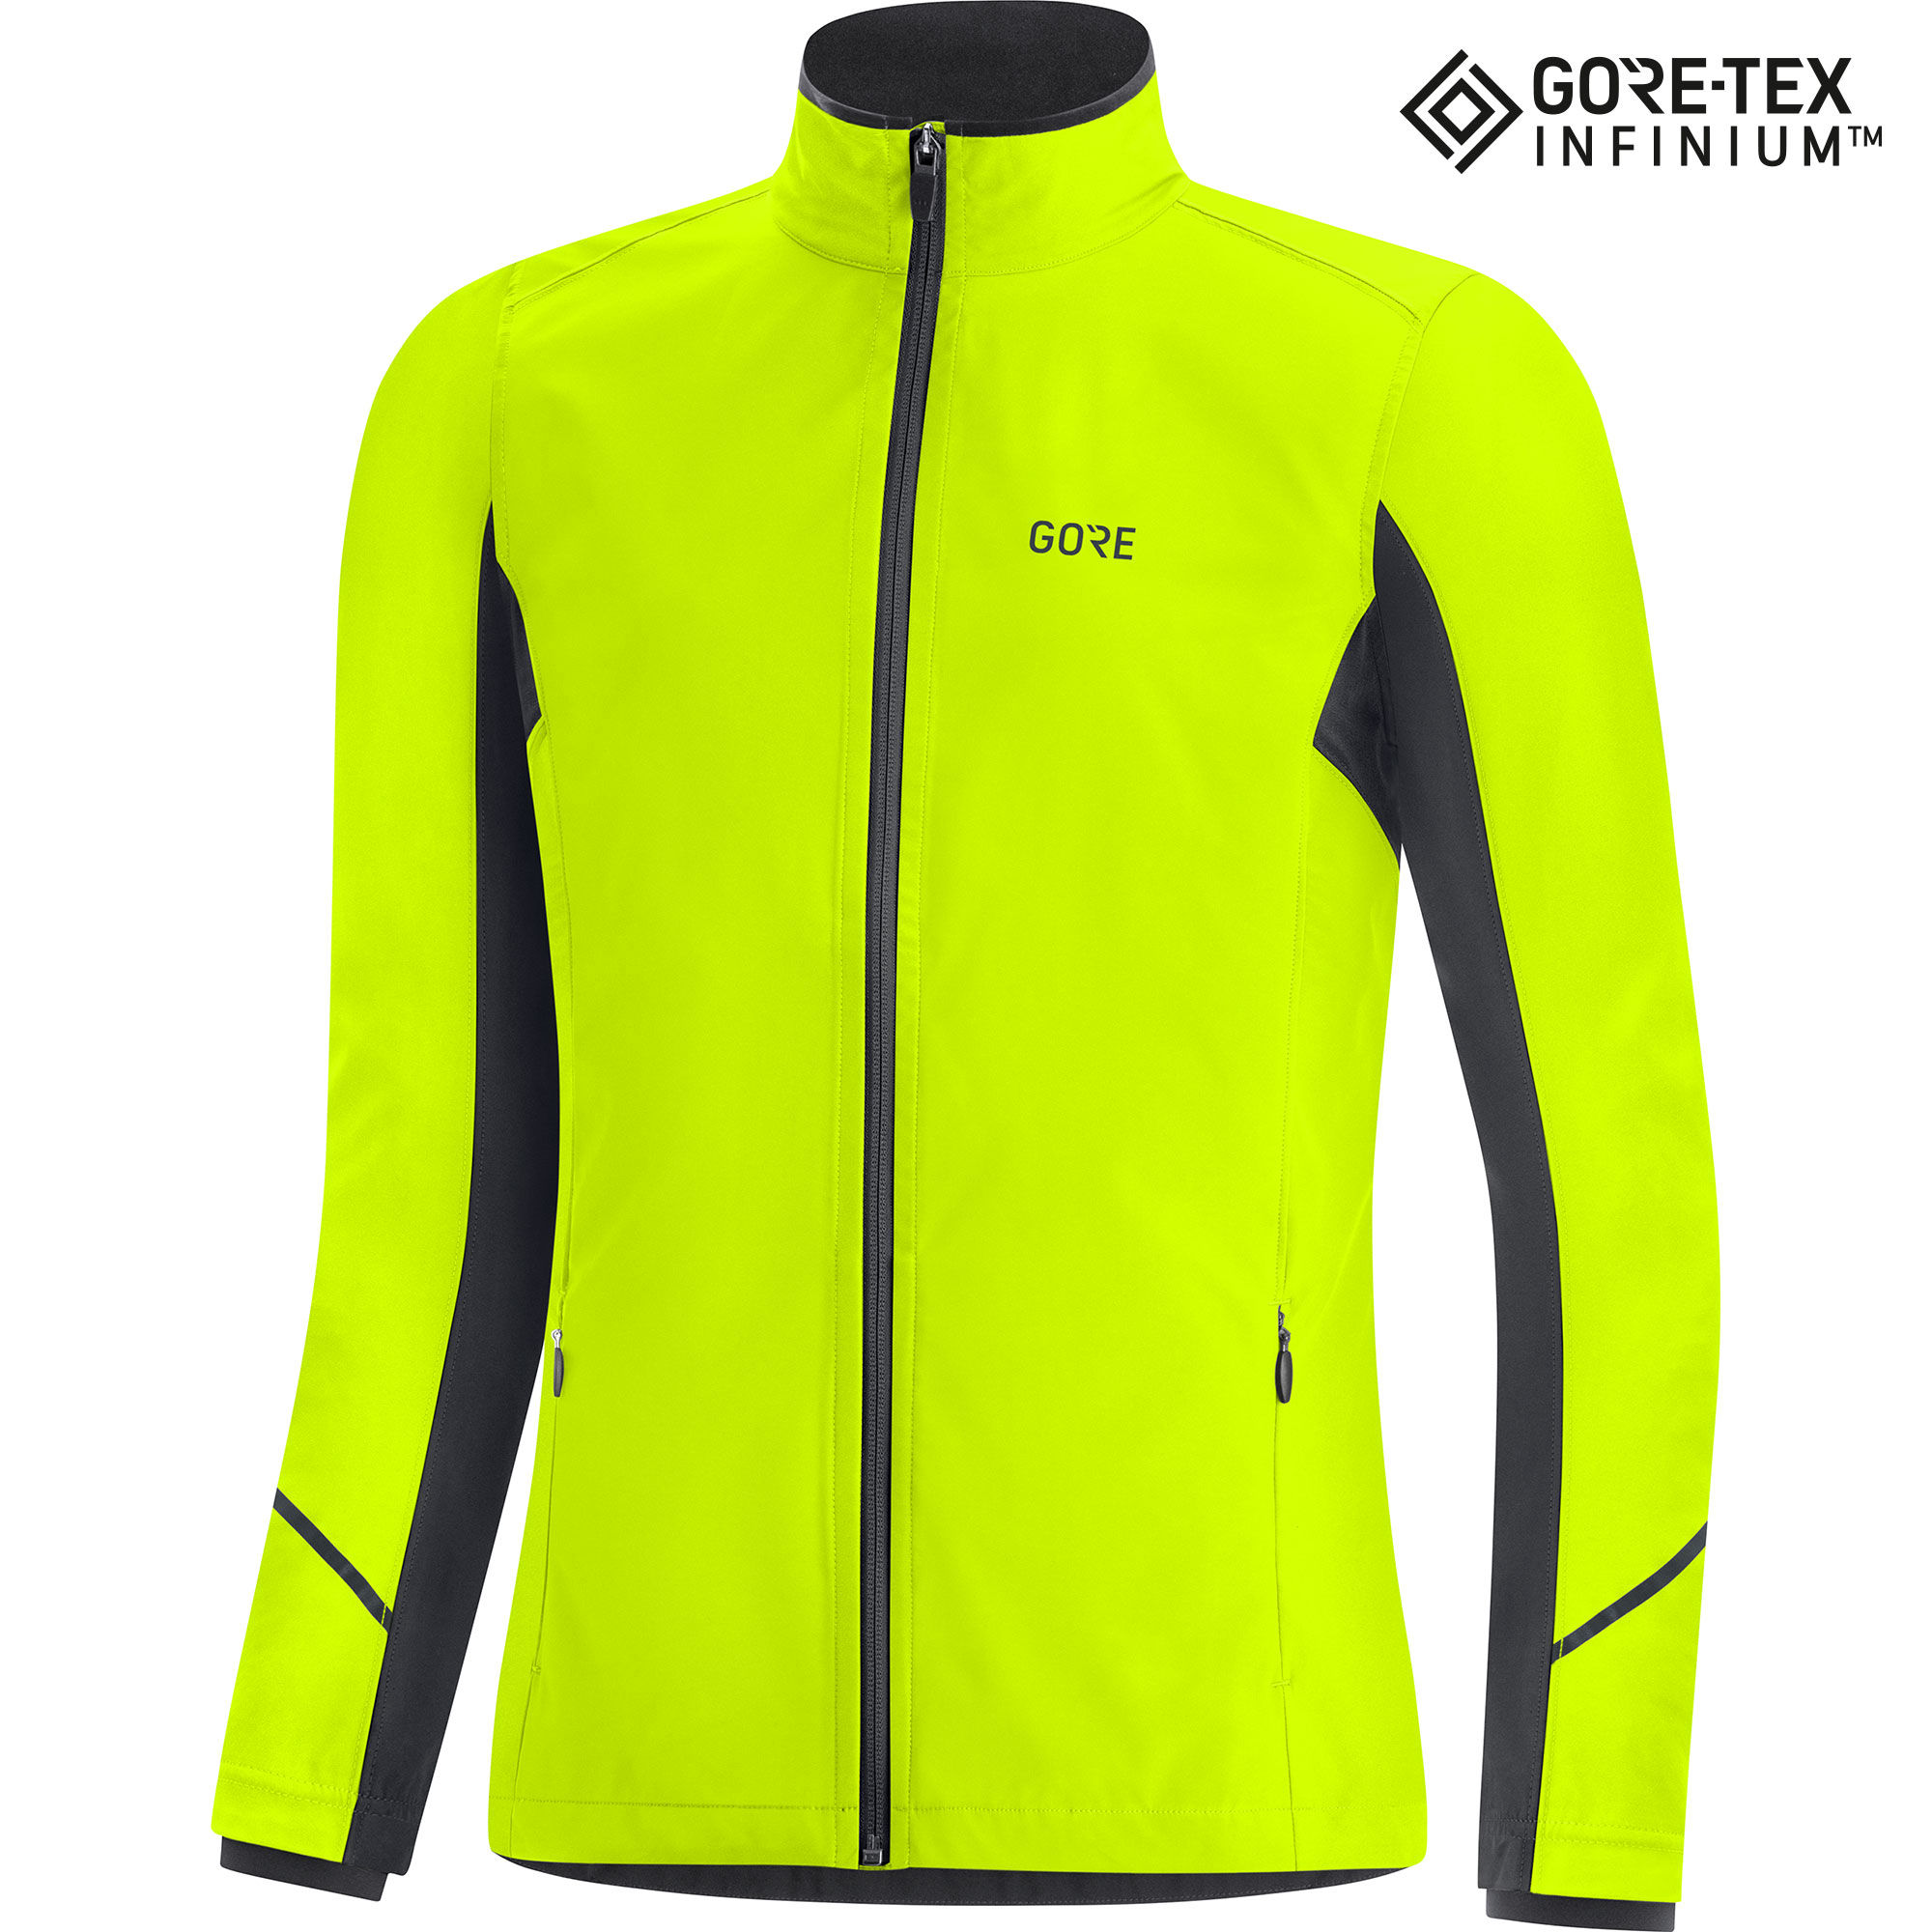 Gore Lady R3 Gore-Tex Infinium Partial Jacket (Neon)